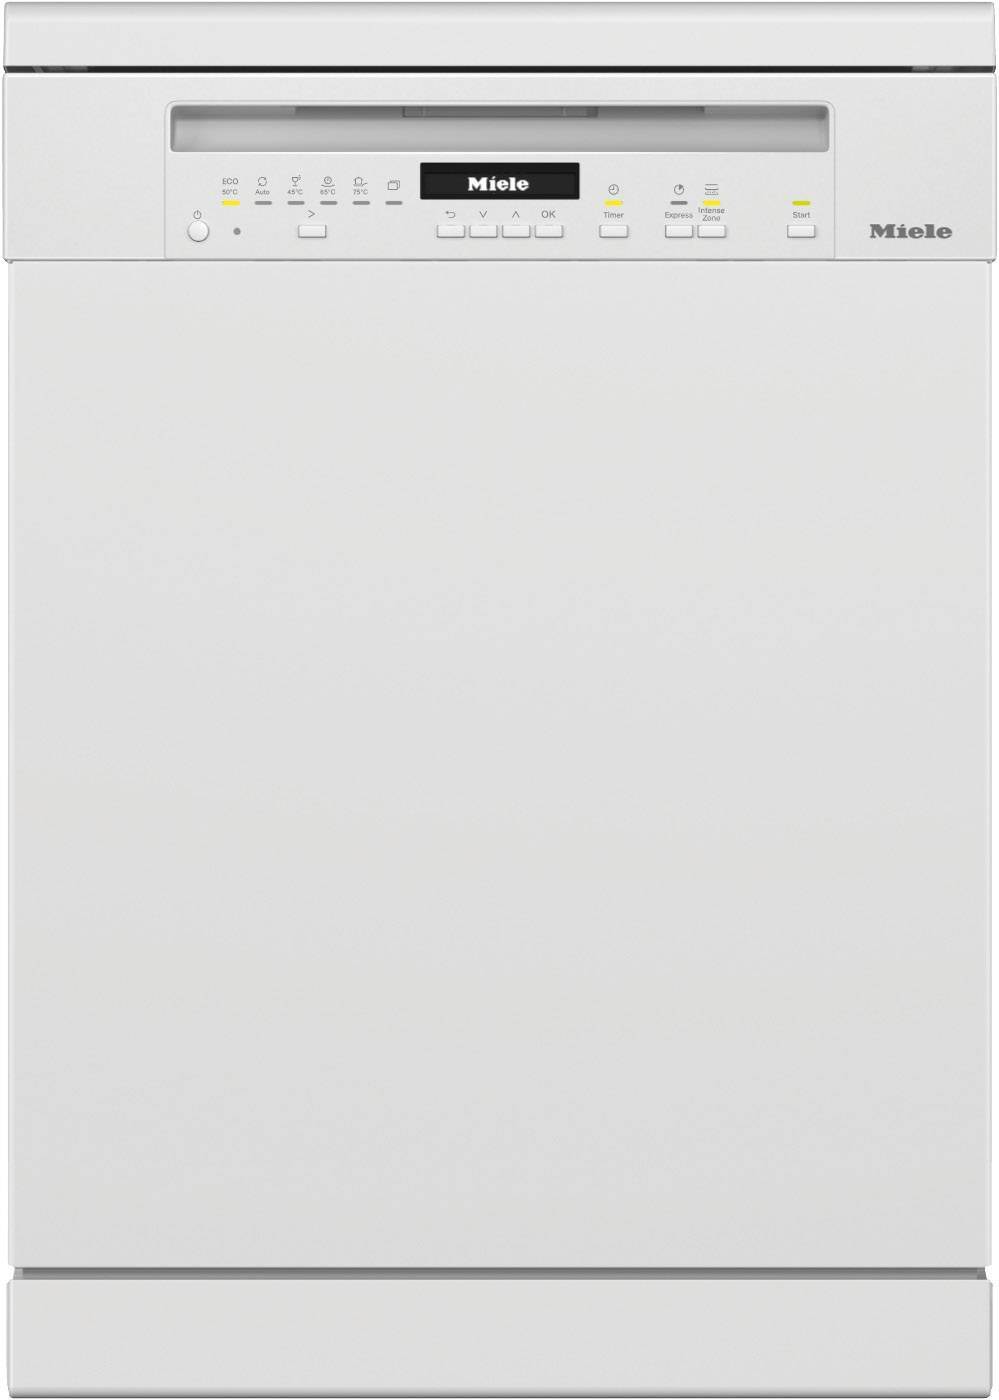 MIELE Einbau Geschirrspüler G 7100 Sci Bw EEK: A+++ Vollintegrierbar Weiß